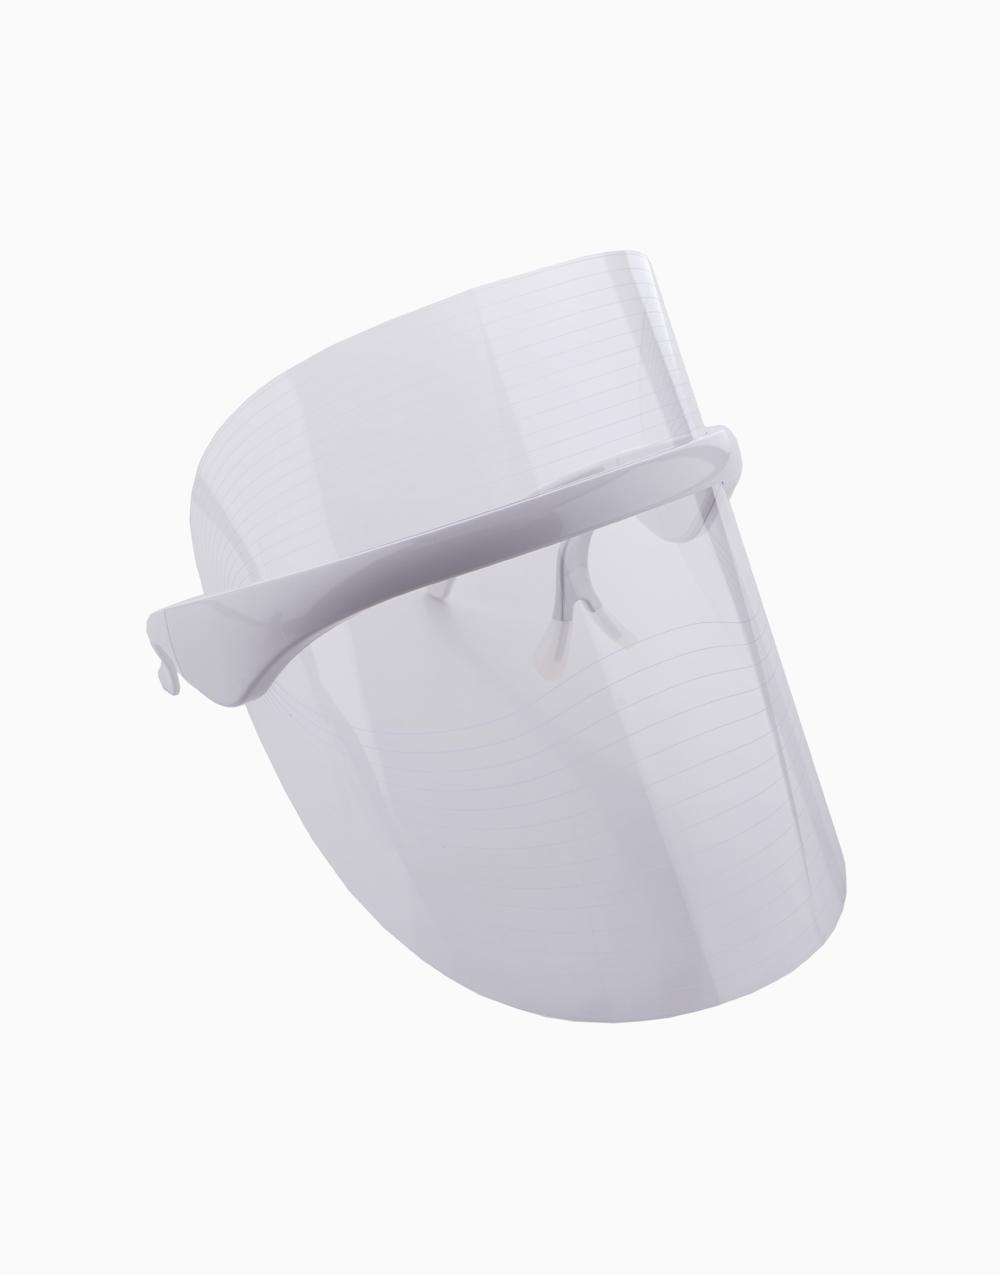 LED Face Mask by BlingBelle